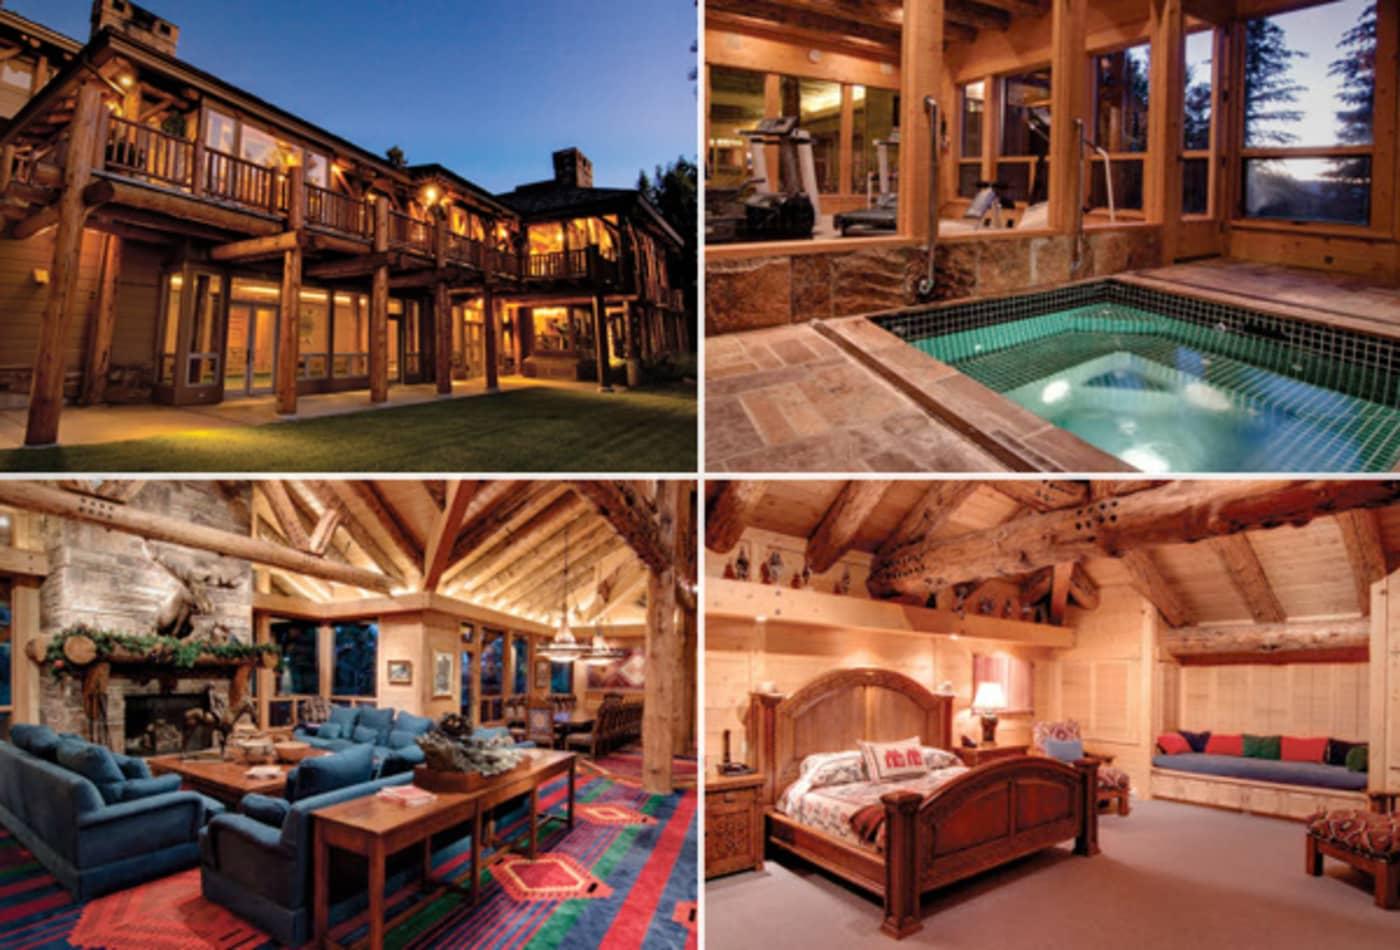 CNBC_luxurious_log_cabins_utah.jpg